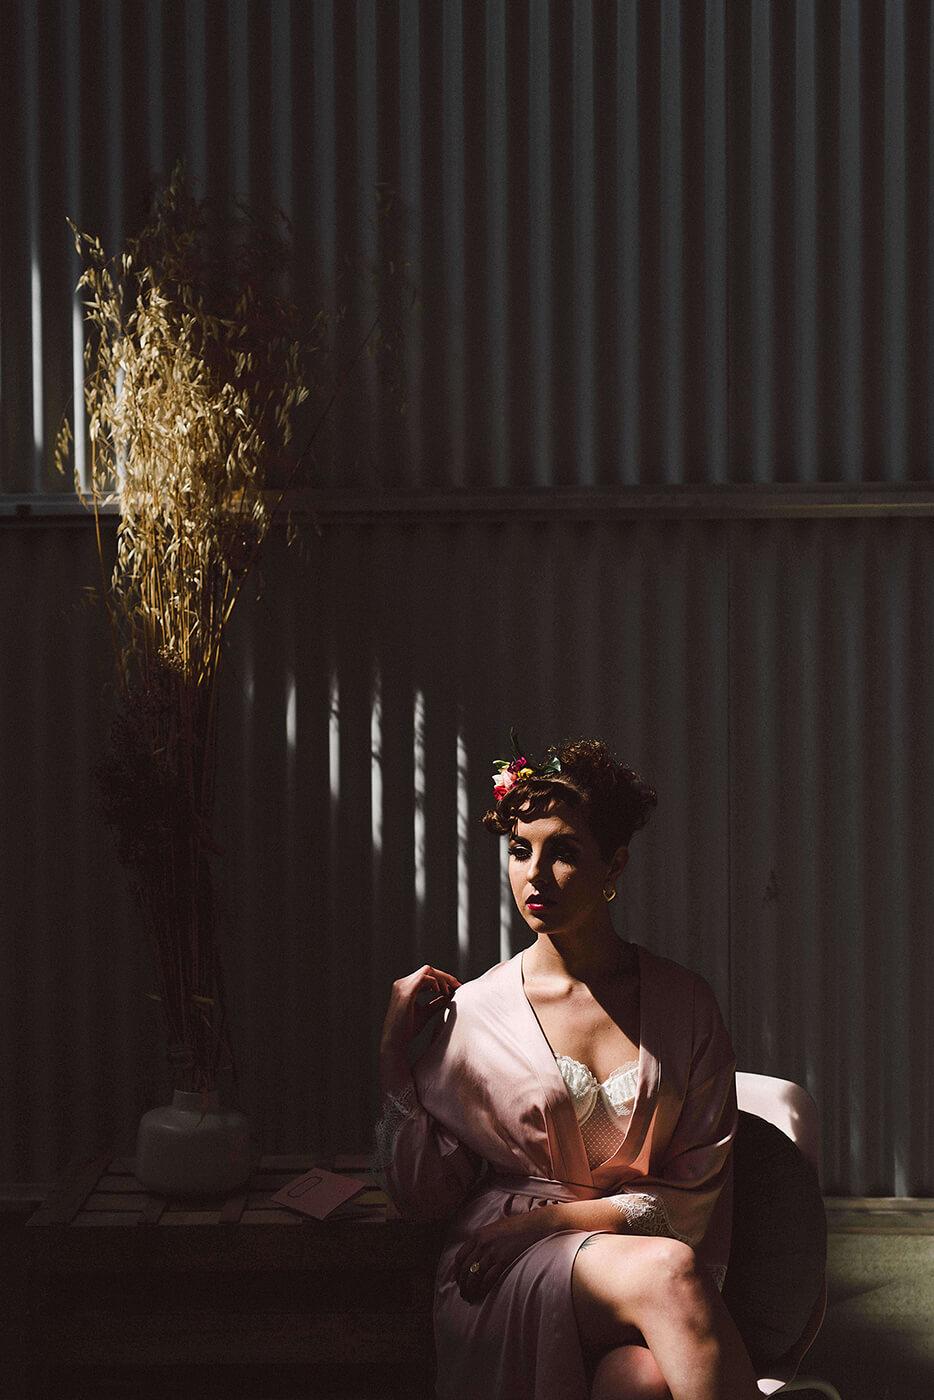 roma-organizacao-eventos-editorial-mid-century-modern-wedding-in-a-strawberry-field-02